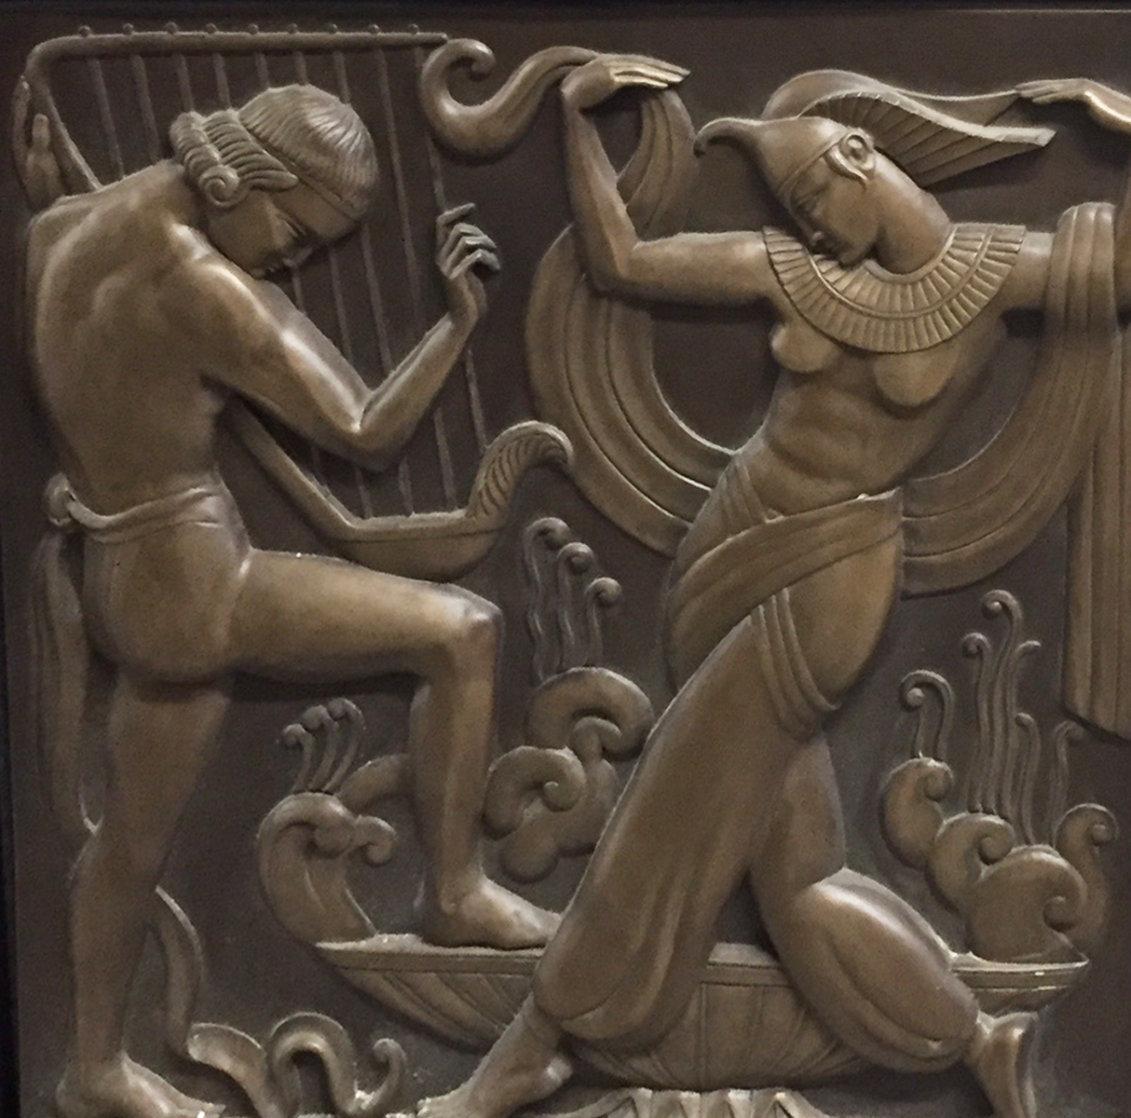 Deco Serenade  Bonded Bronze Sculpture 1986 37x37 Sculpture by Bill Mack